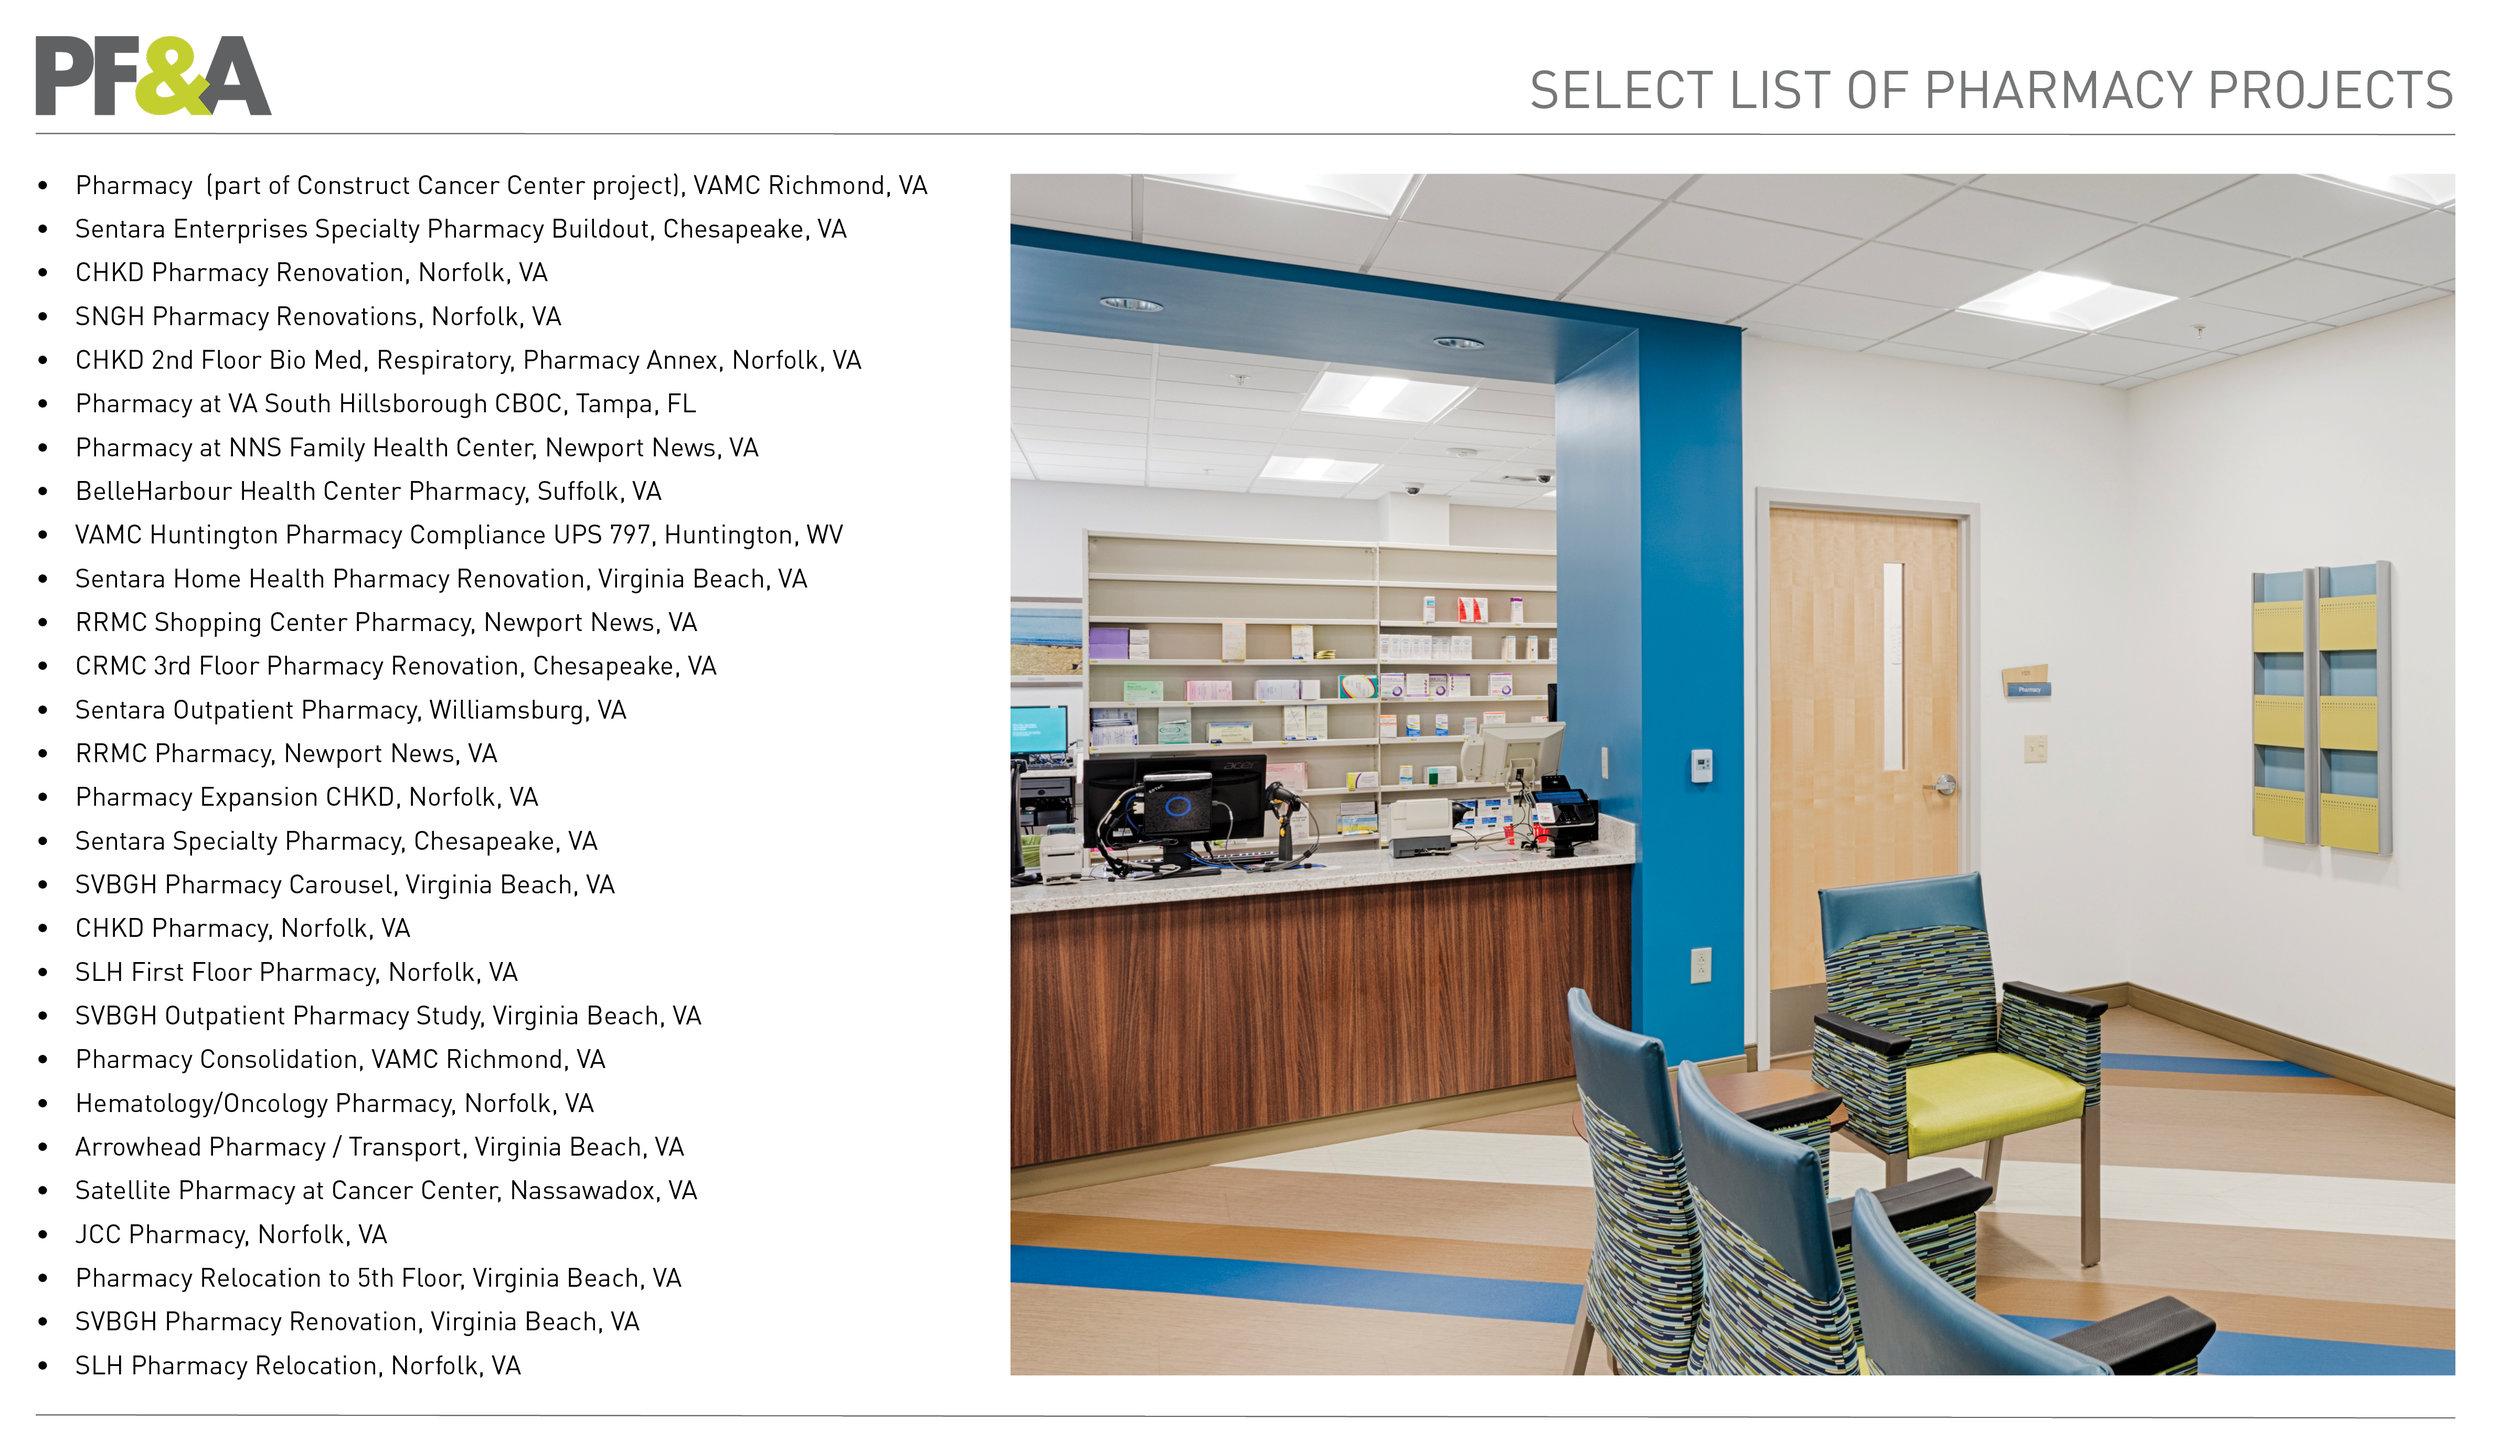 List of Pharmacy Projects.jpg